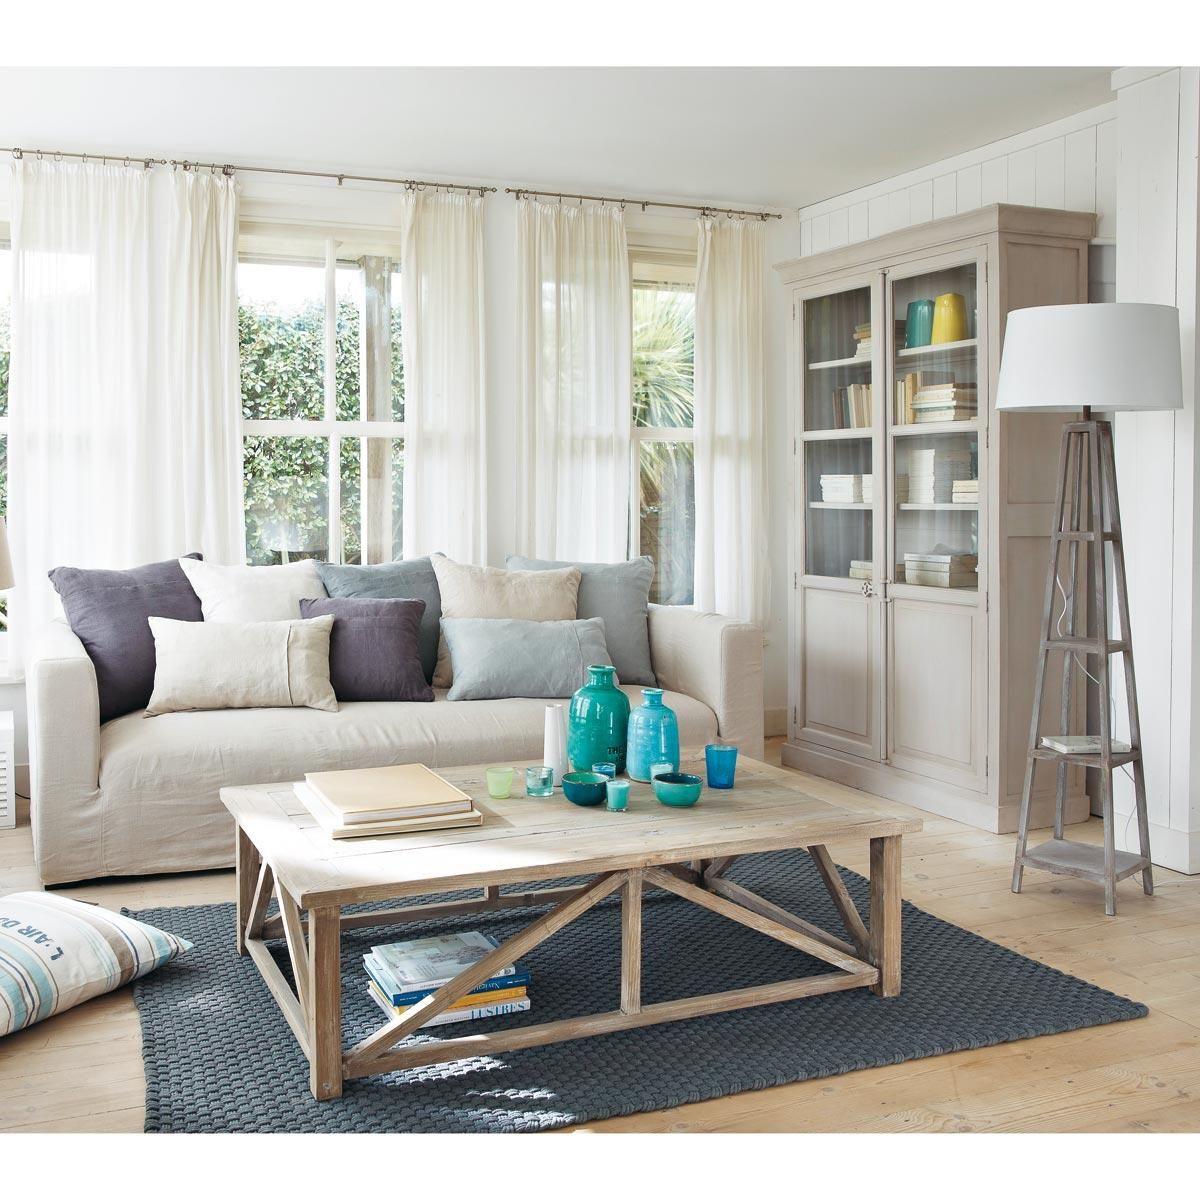 Tapijt Basket Antracietgrijs 140 X 200 Voor De Inkom Deco Maison Mobilier De Salon Deco